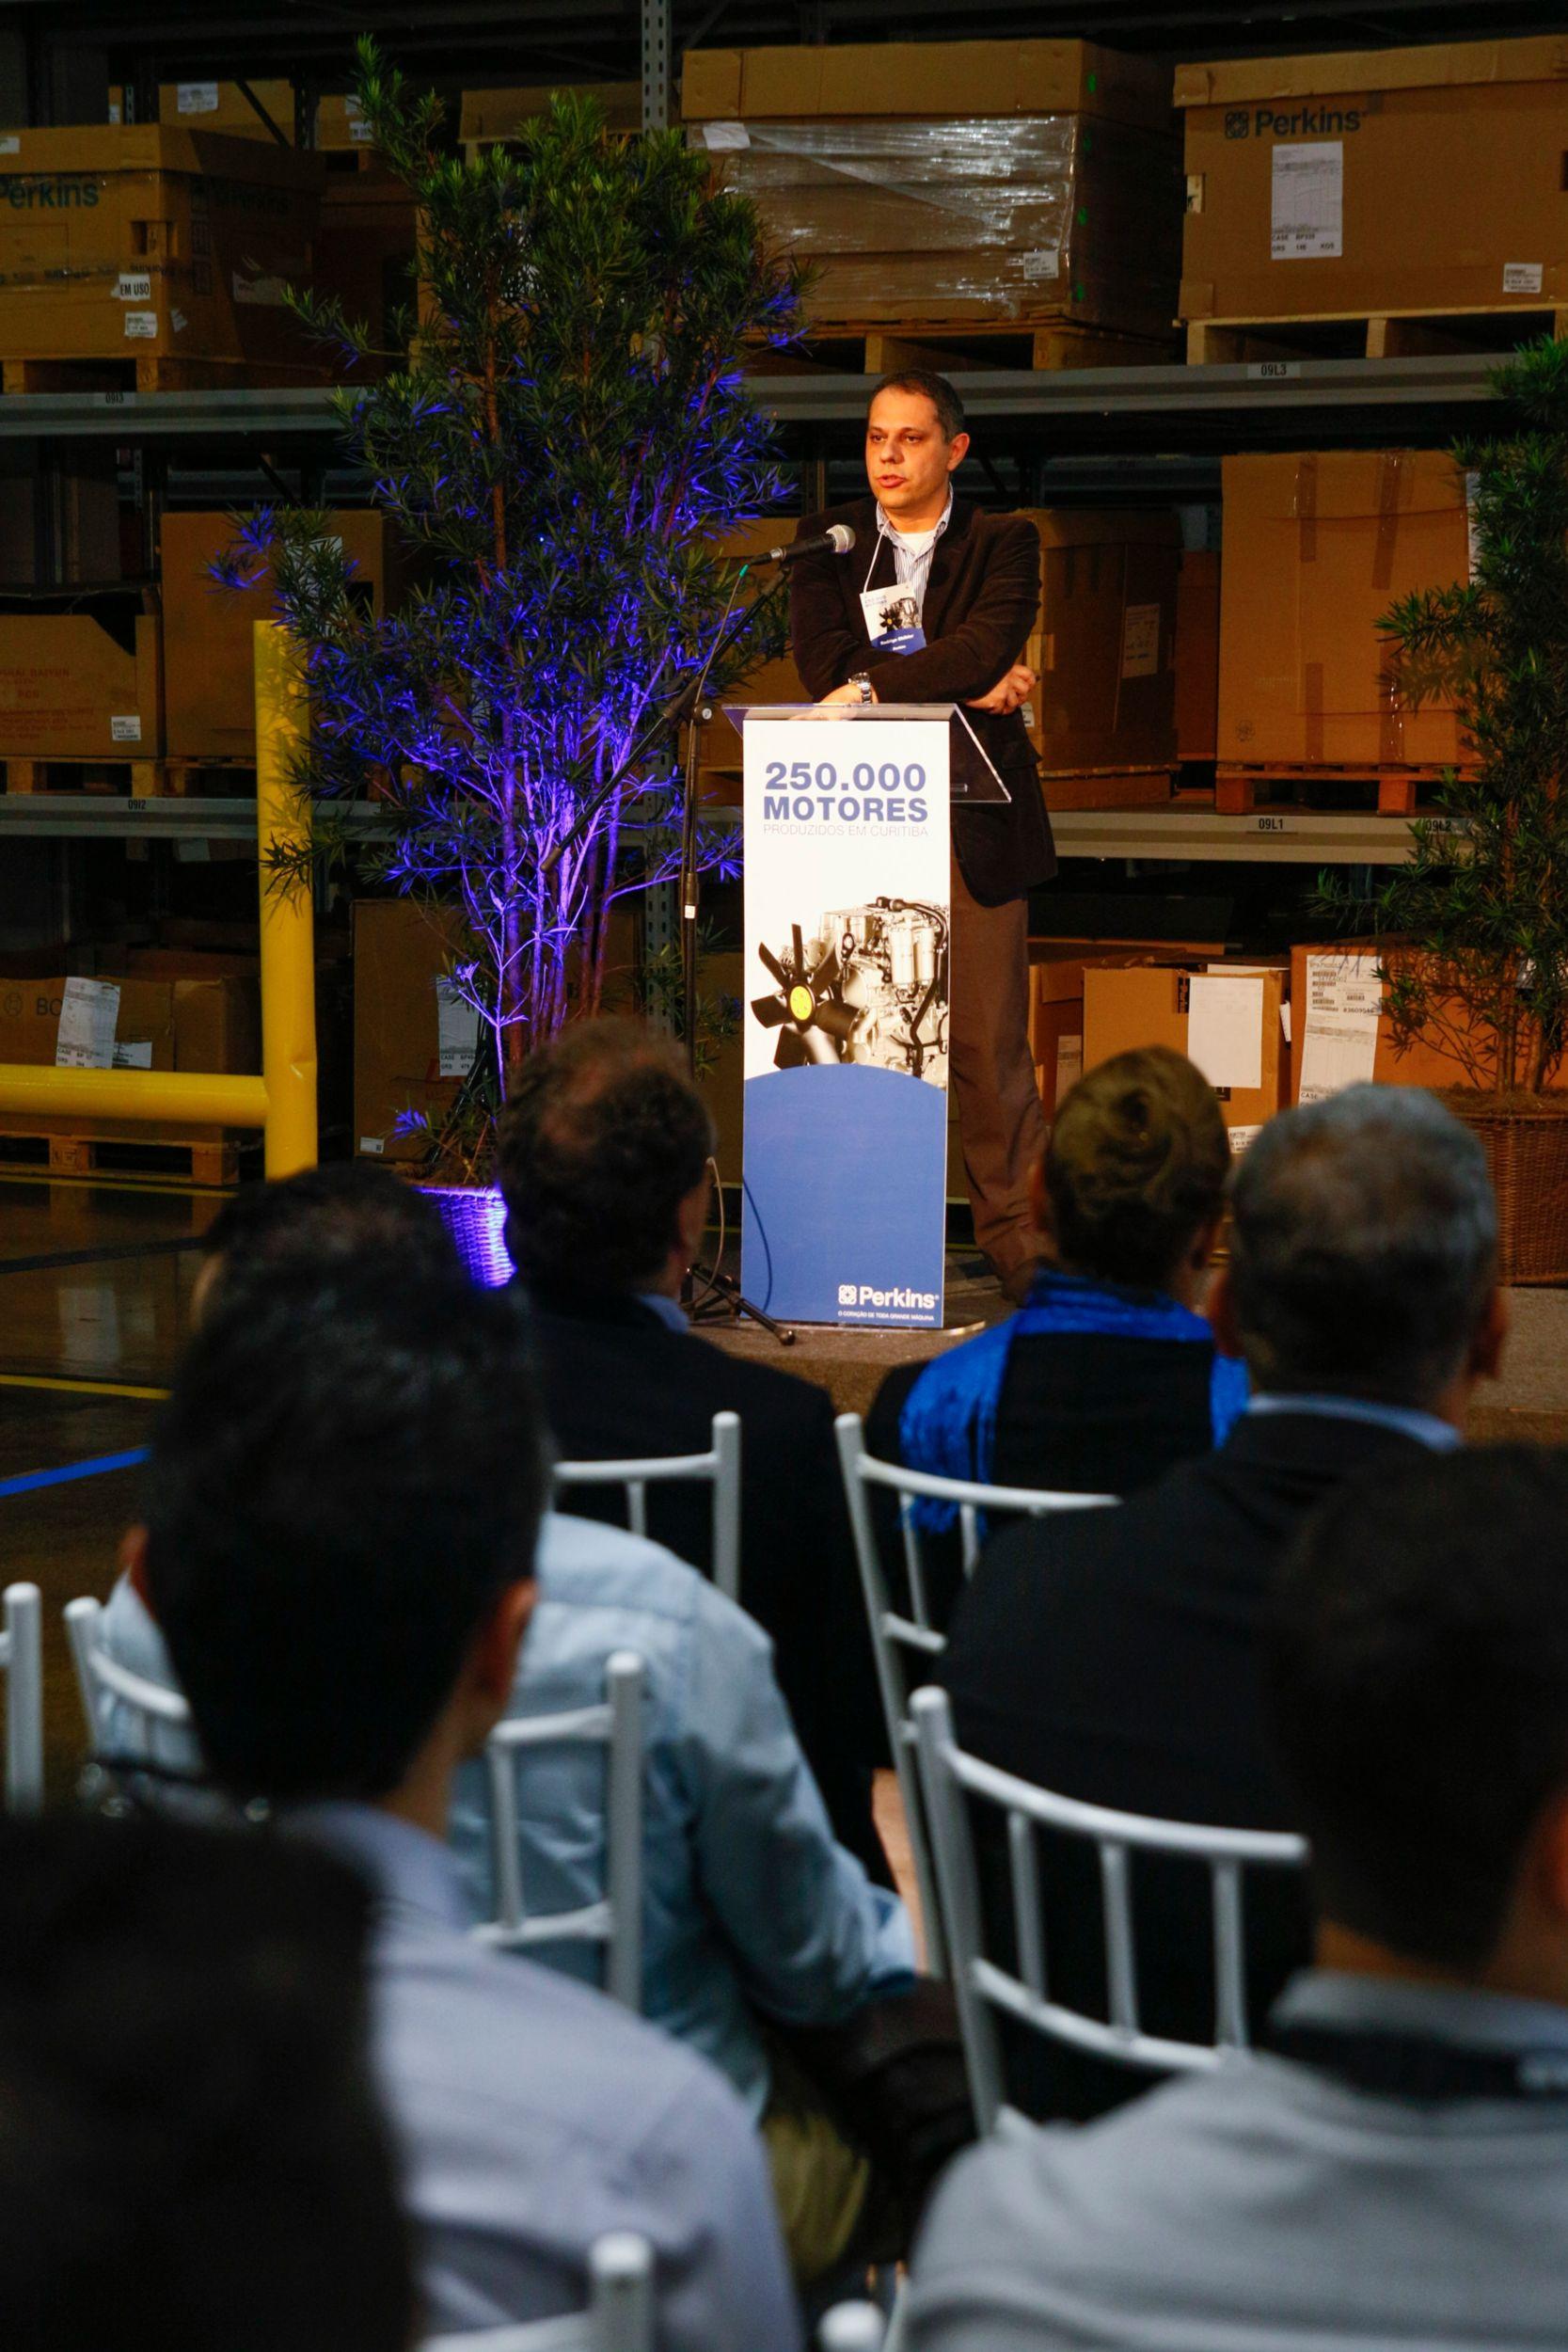 Perkins Curitiba facility celebrates 250,000th engine milestone